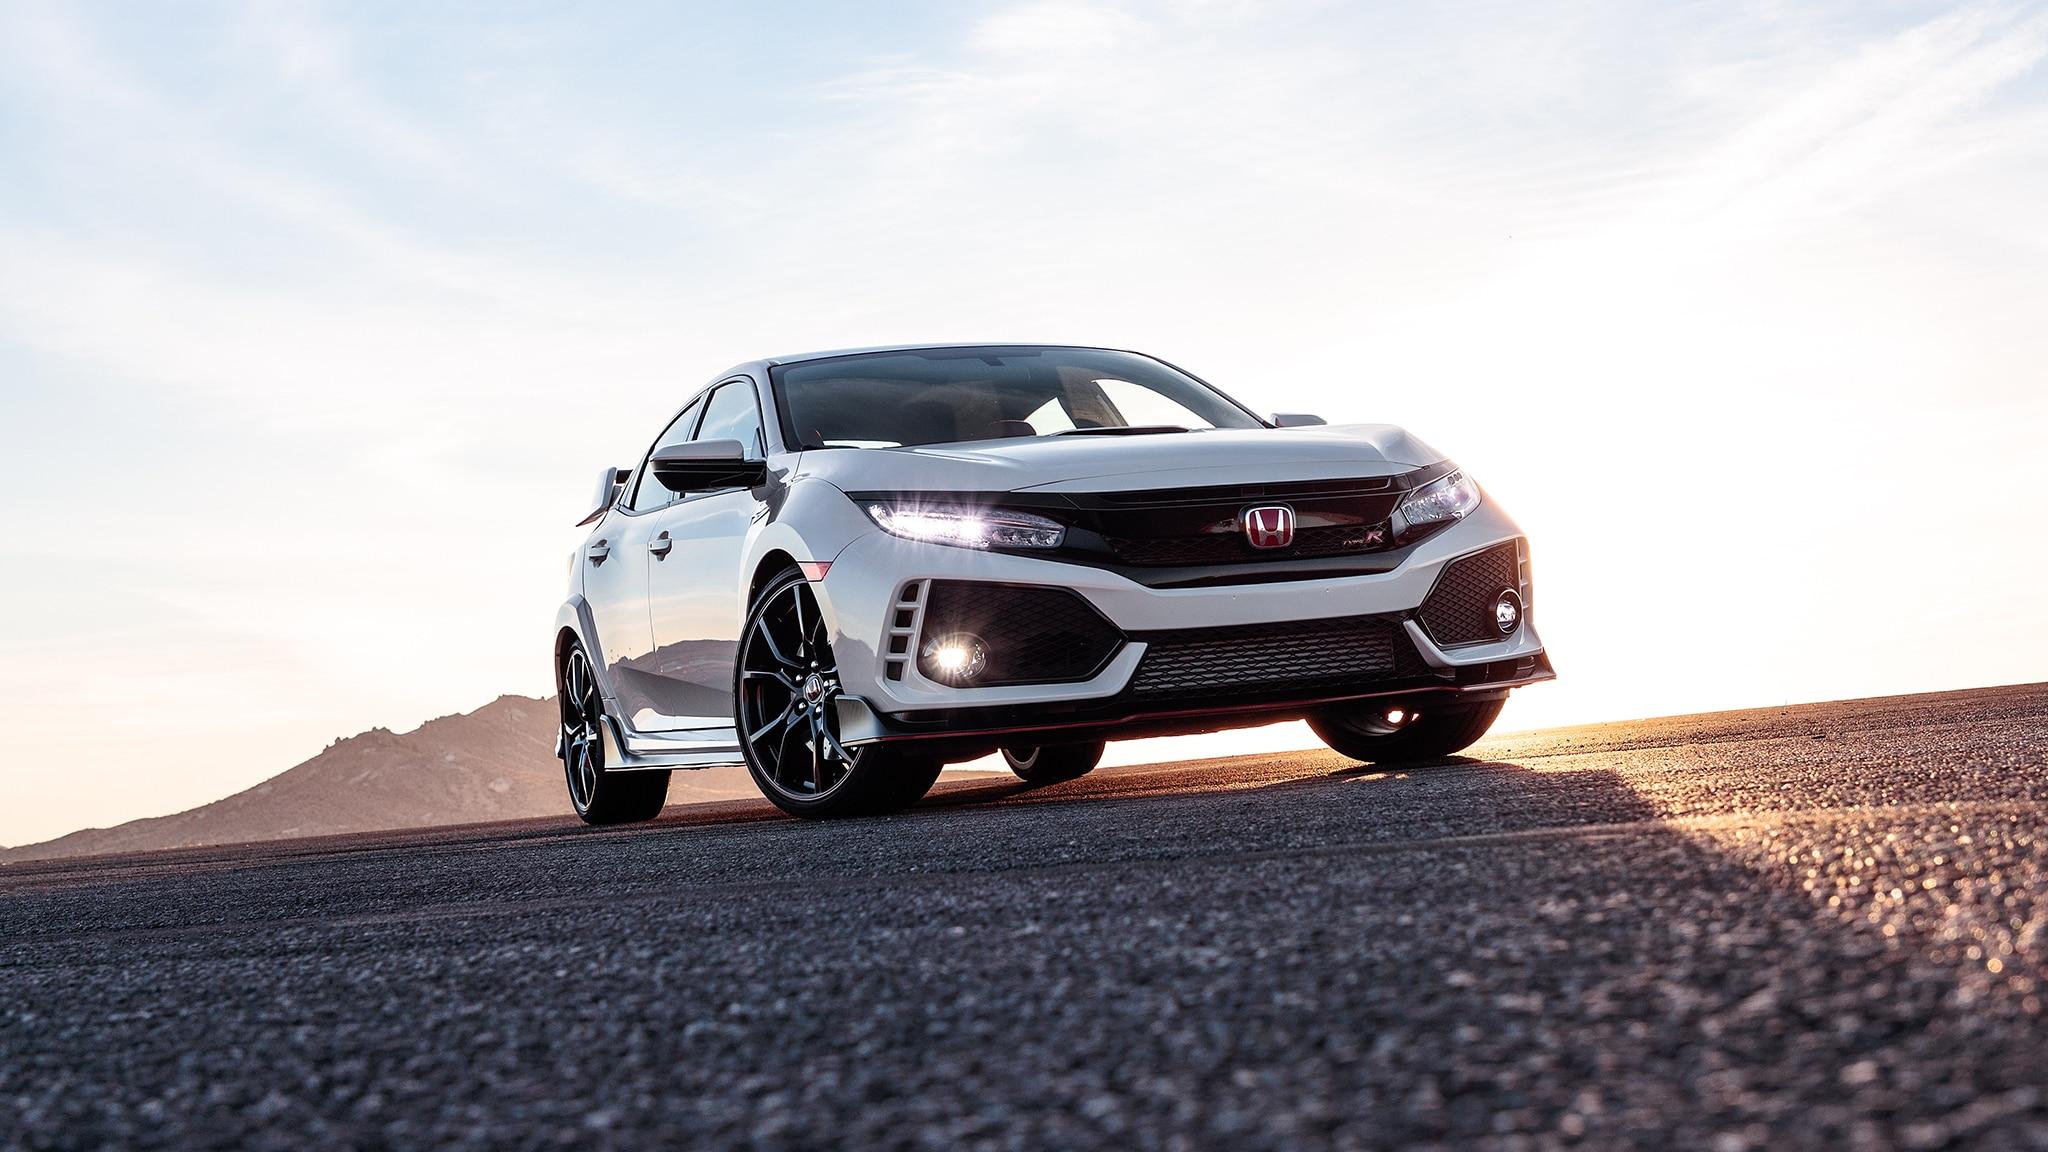 2017 Honda Civic Type R Four Seasons Update